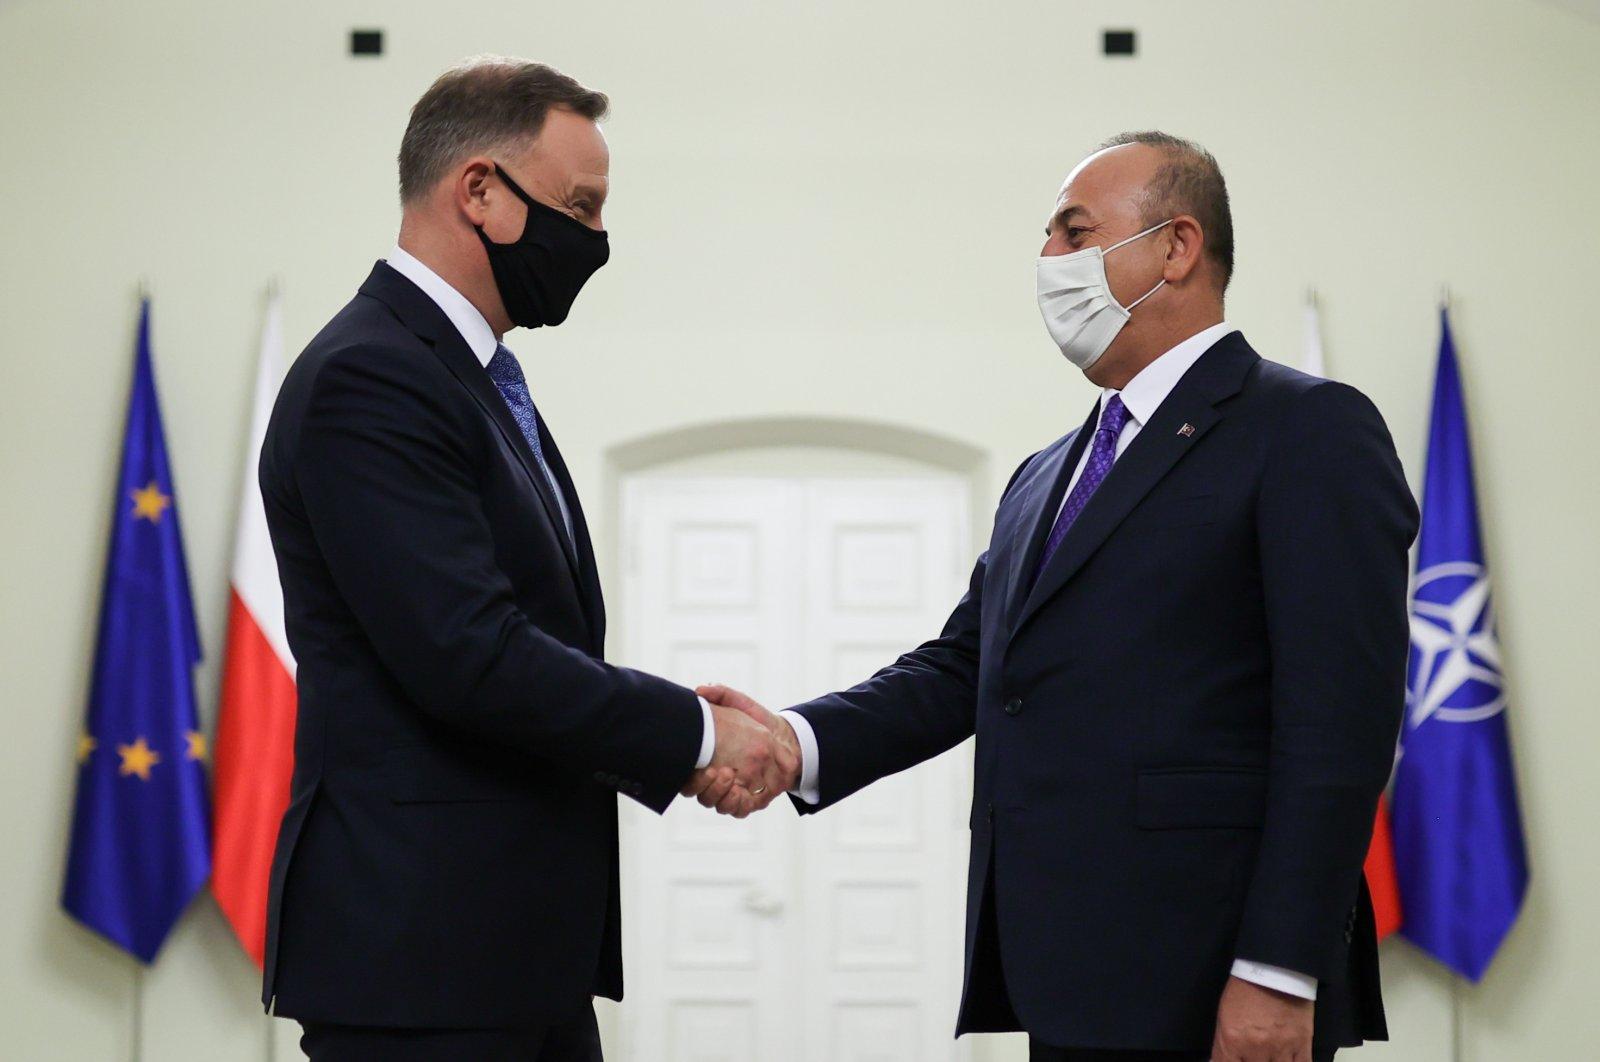 Poland's President Andrzej Duda receives Foreign Minister Mevlüt Çavuşoğlu in Warsaw, Poland, Oct. 4, 2021 (AA Photo)